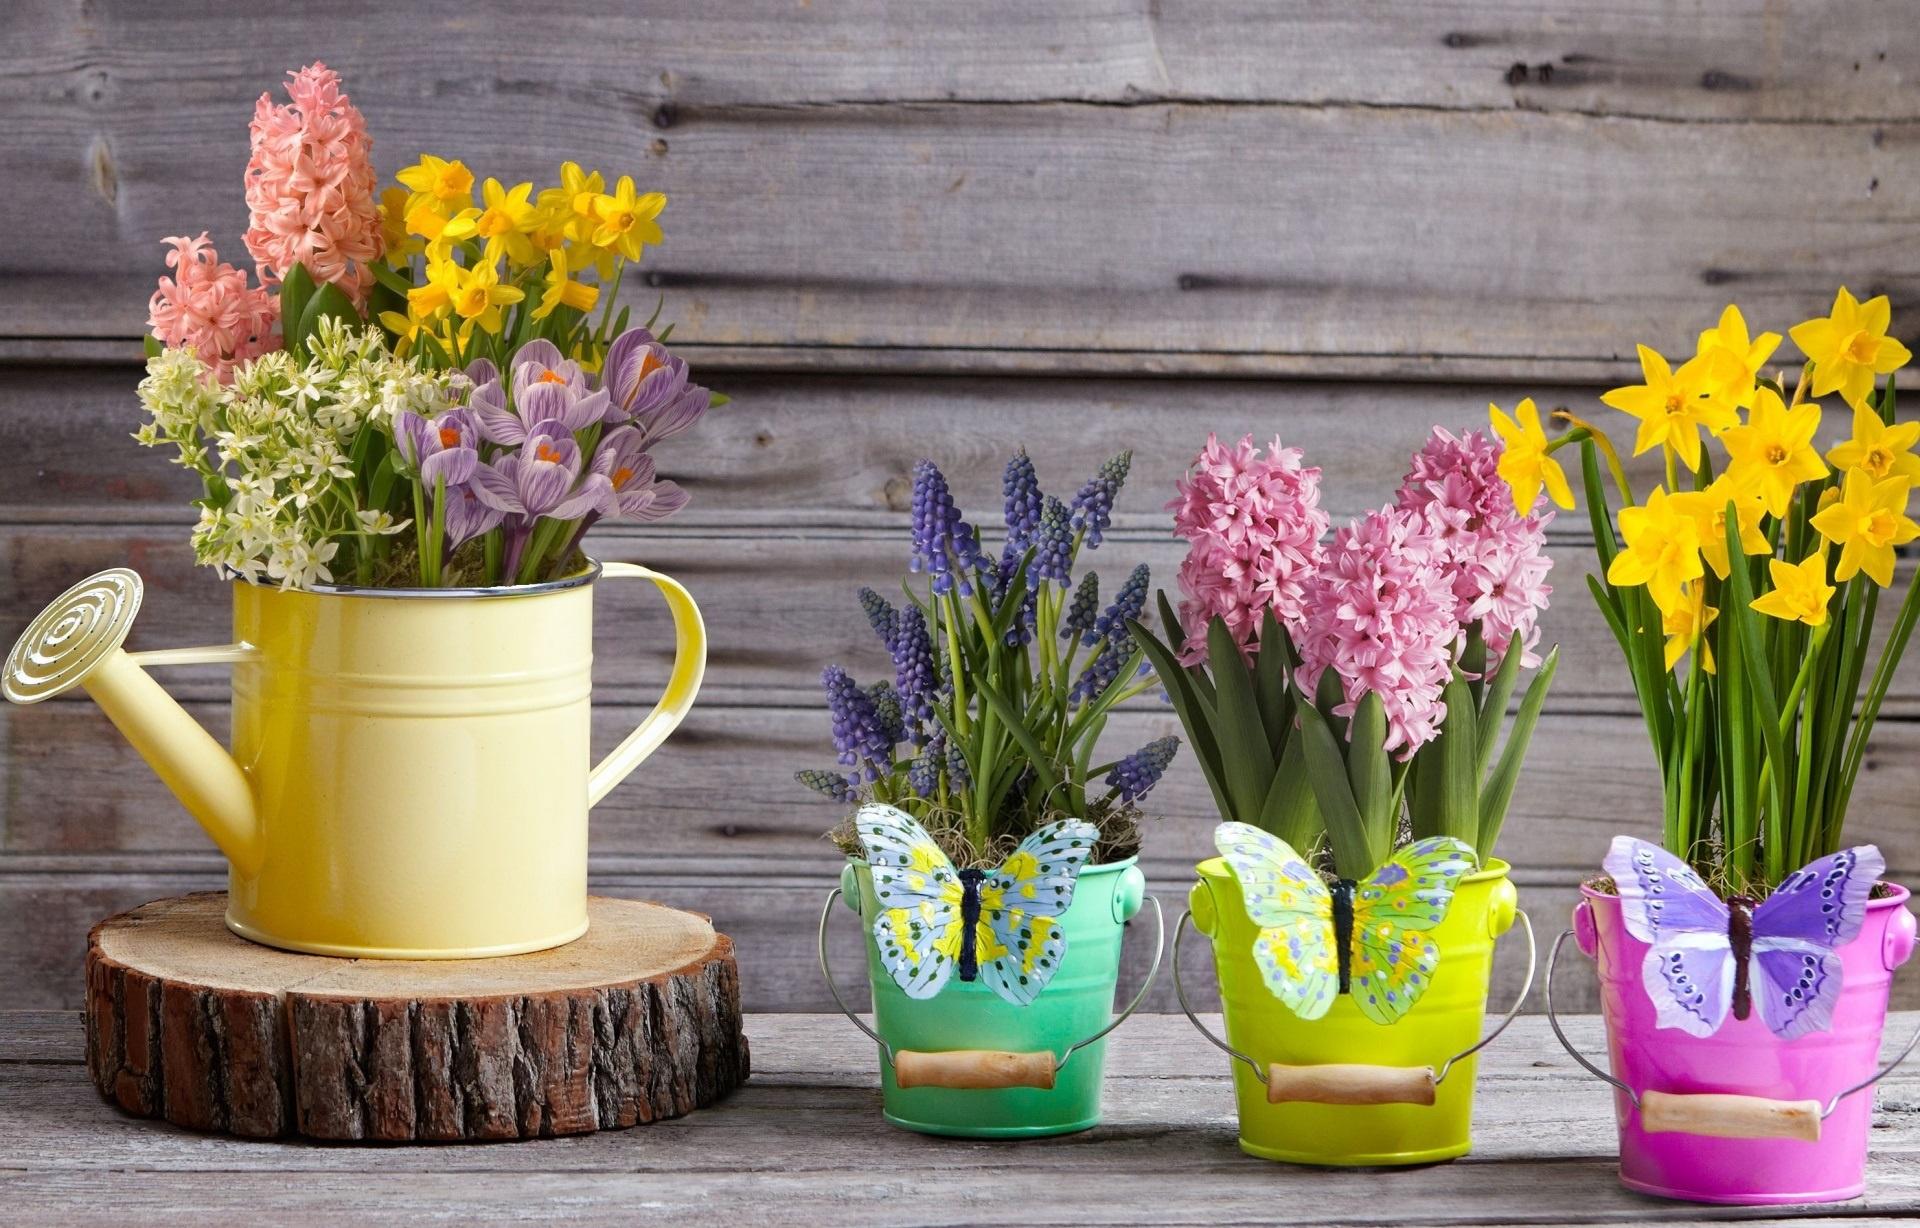 природа цветы ведро  № 464555 бесплатно